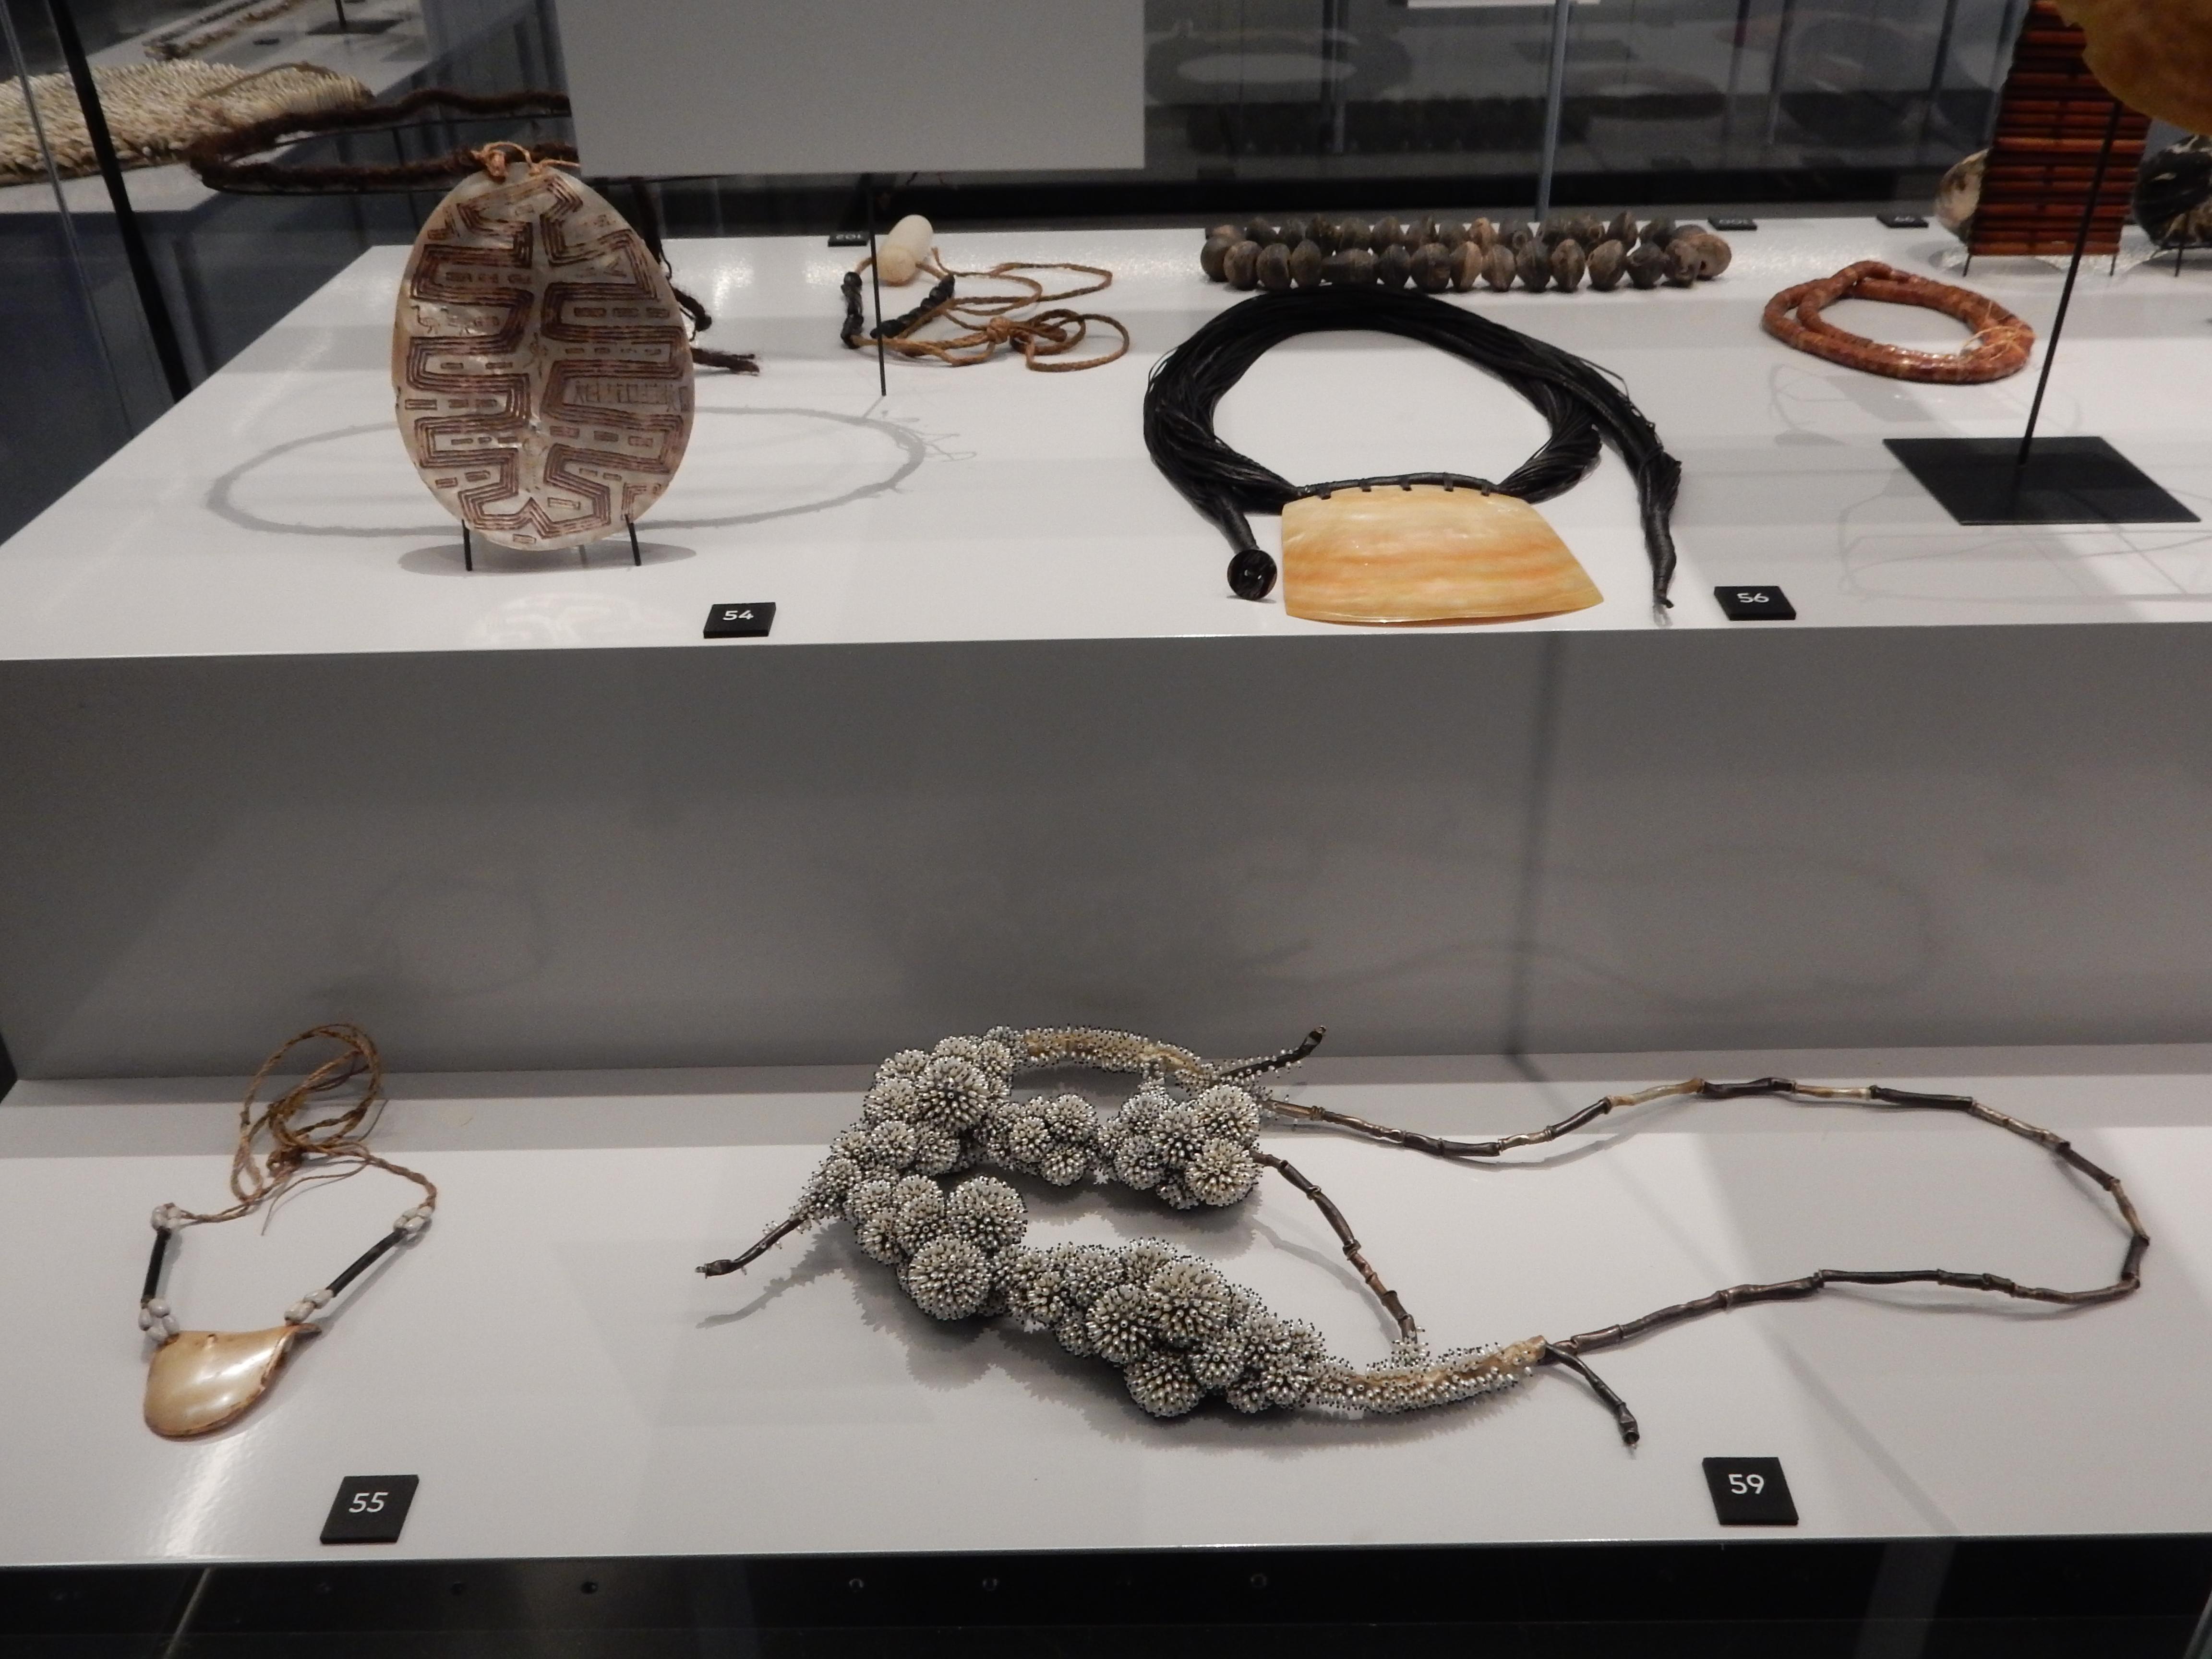 Sieraden, makers en dragers, Natuur, Afrika Museum, Berg en Dal. Foto met dank aan Coert Peter Krabbe, 2018, CC BY 4.0